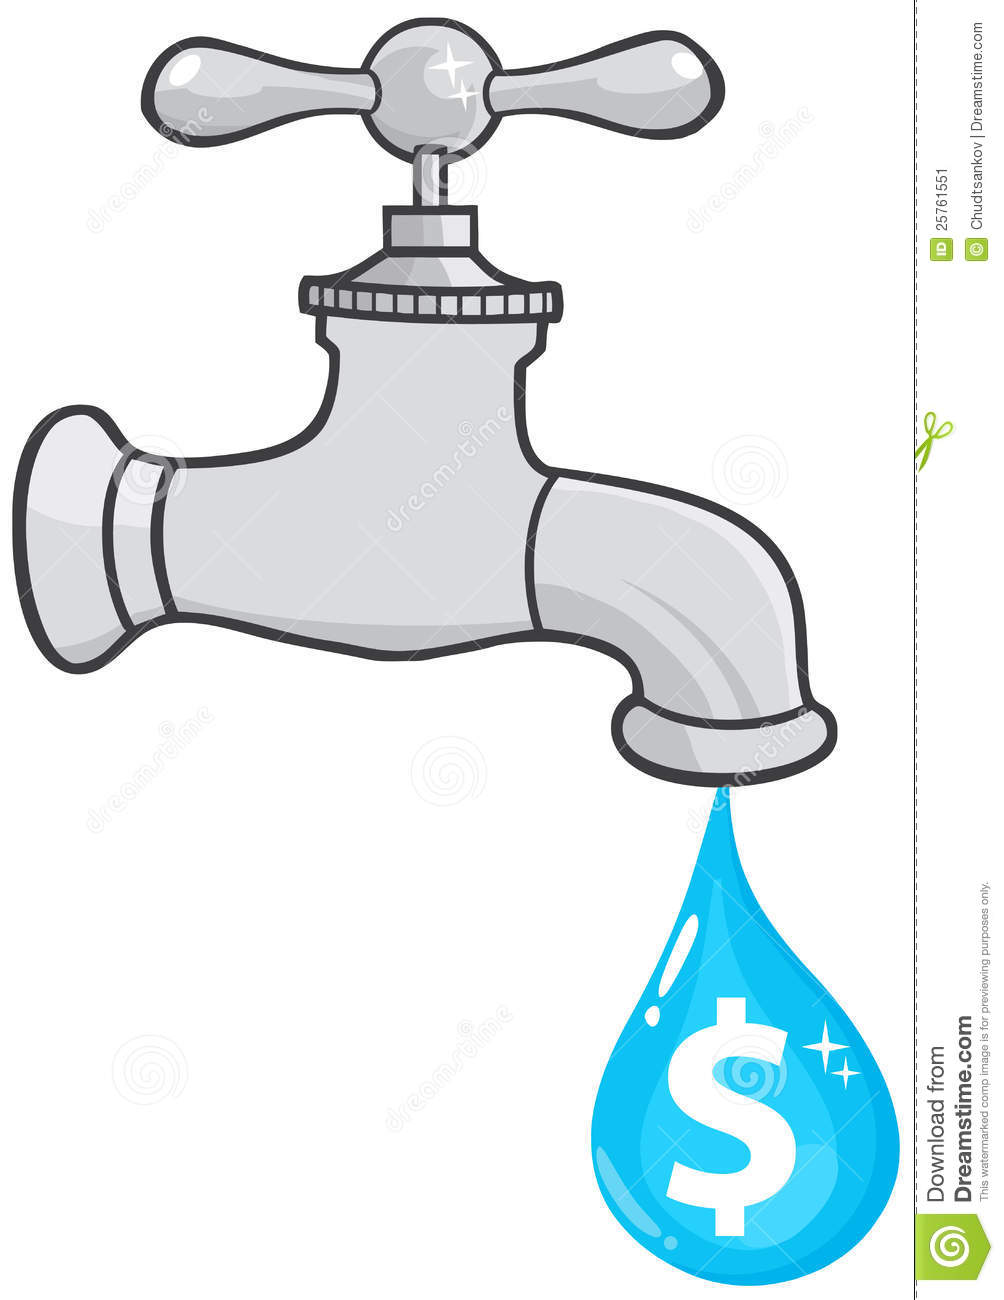 Clipart water faucet jpg transparent 83+ Water Faucet Clipart | ClipartLook jpg transparent